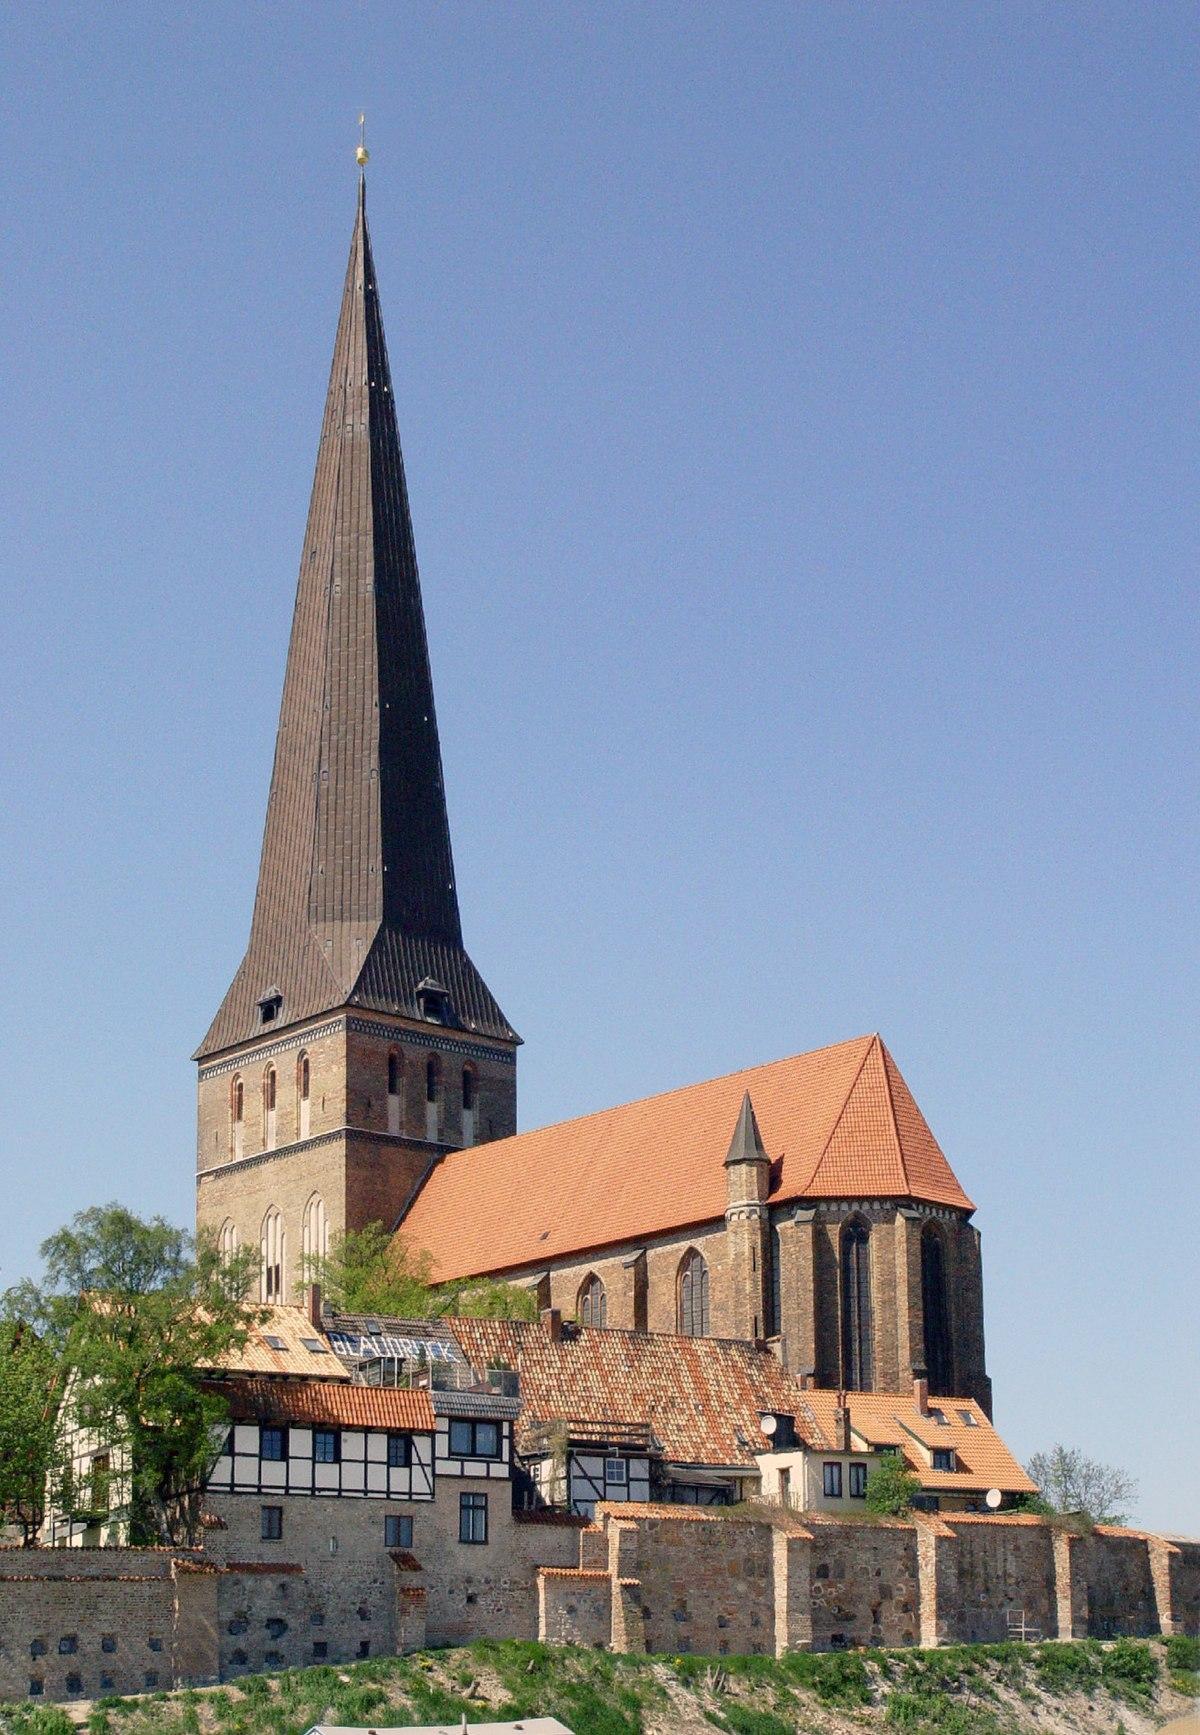 Petridamm Rostock